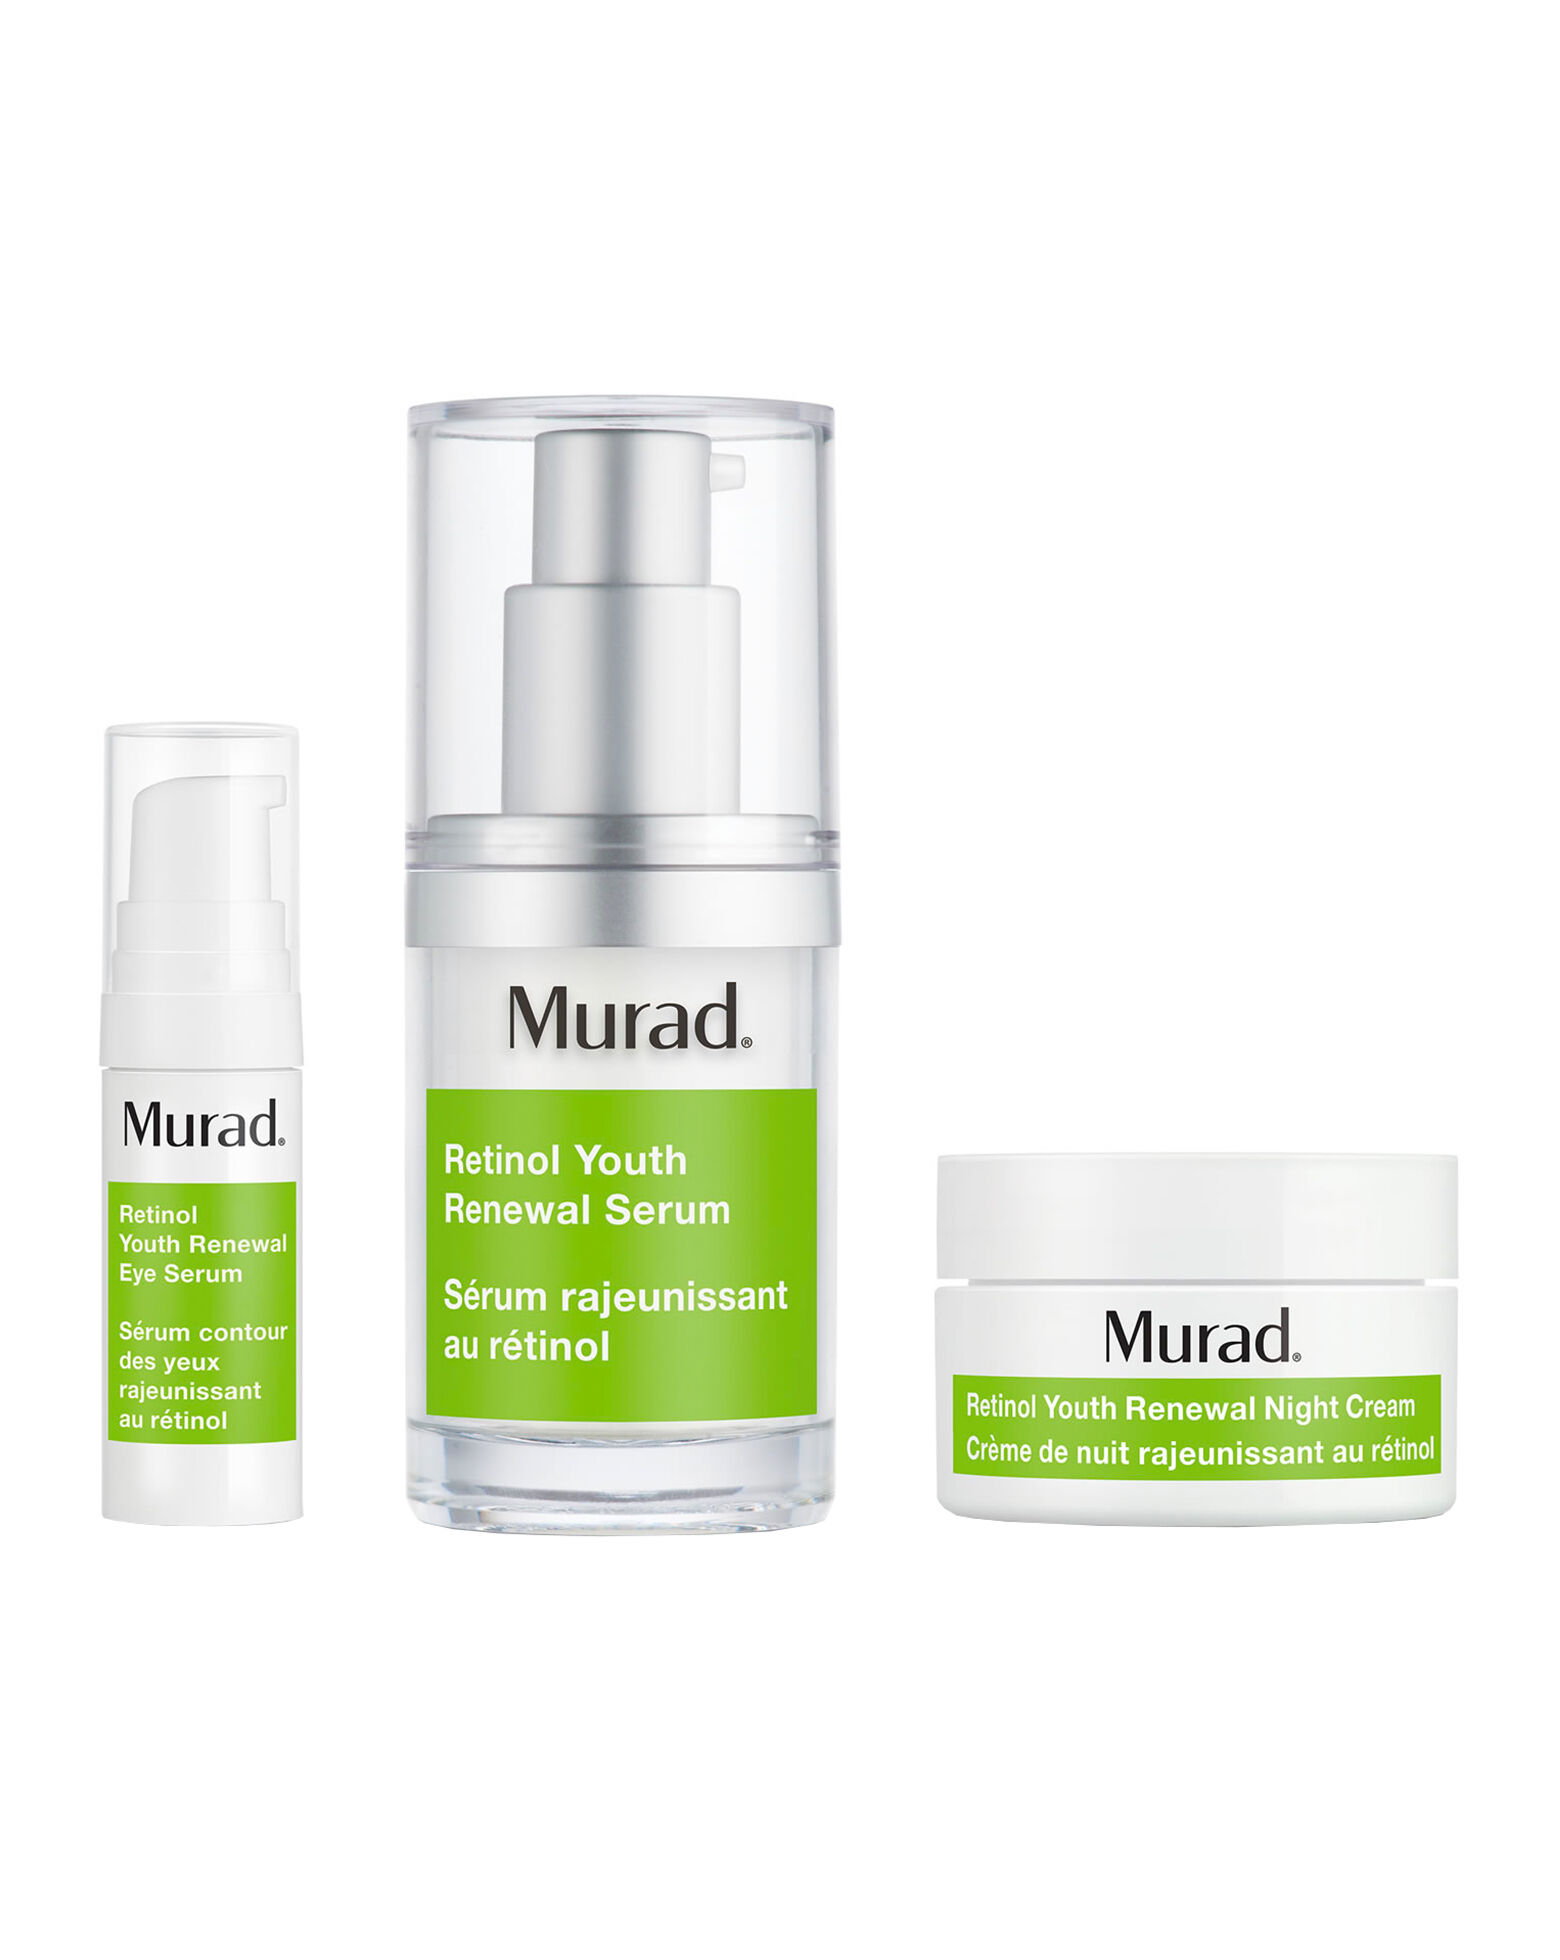 Murad - Ready. Radiant. Retinol.